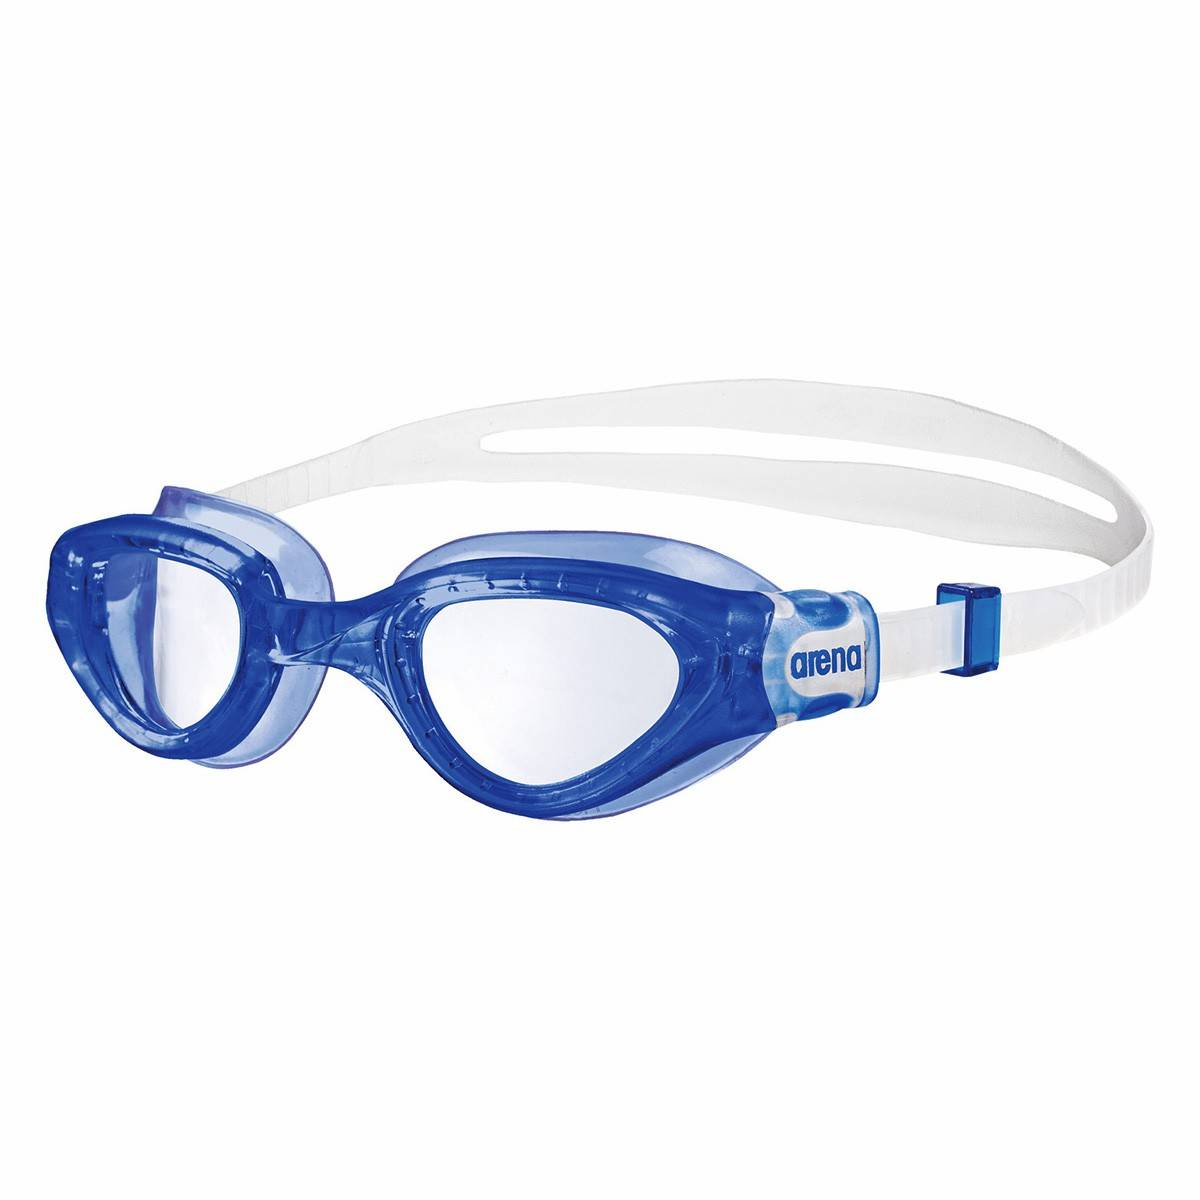 Arena Occhialini piscina Arena Cruiser Soft blu (Colore: blu-bianco, Taglia: UNI)